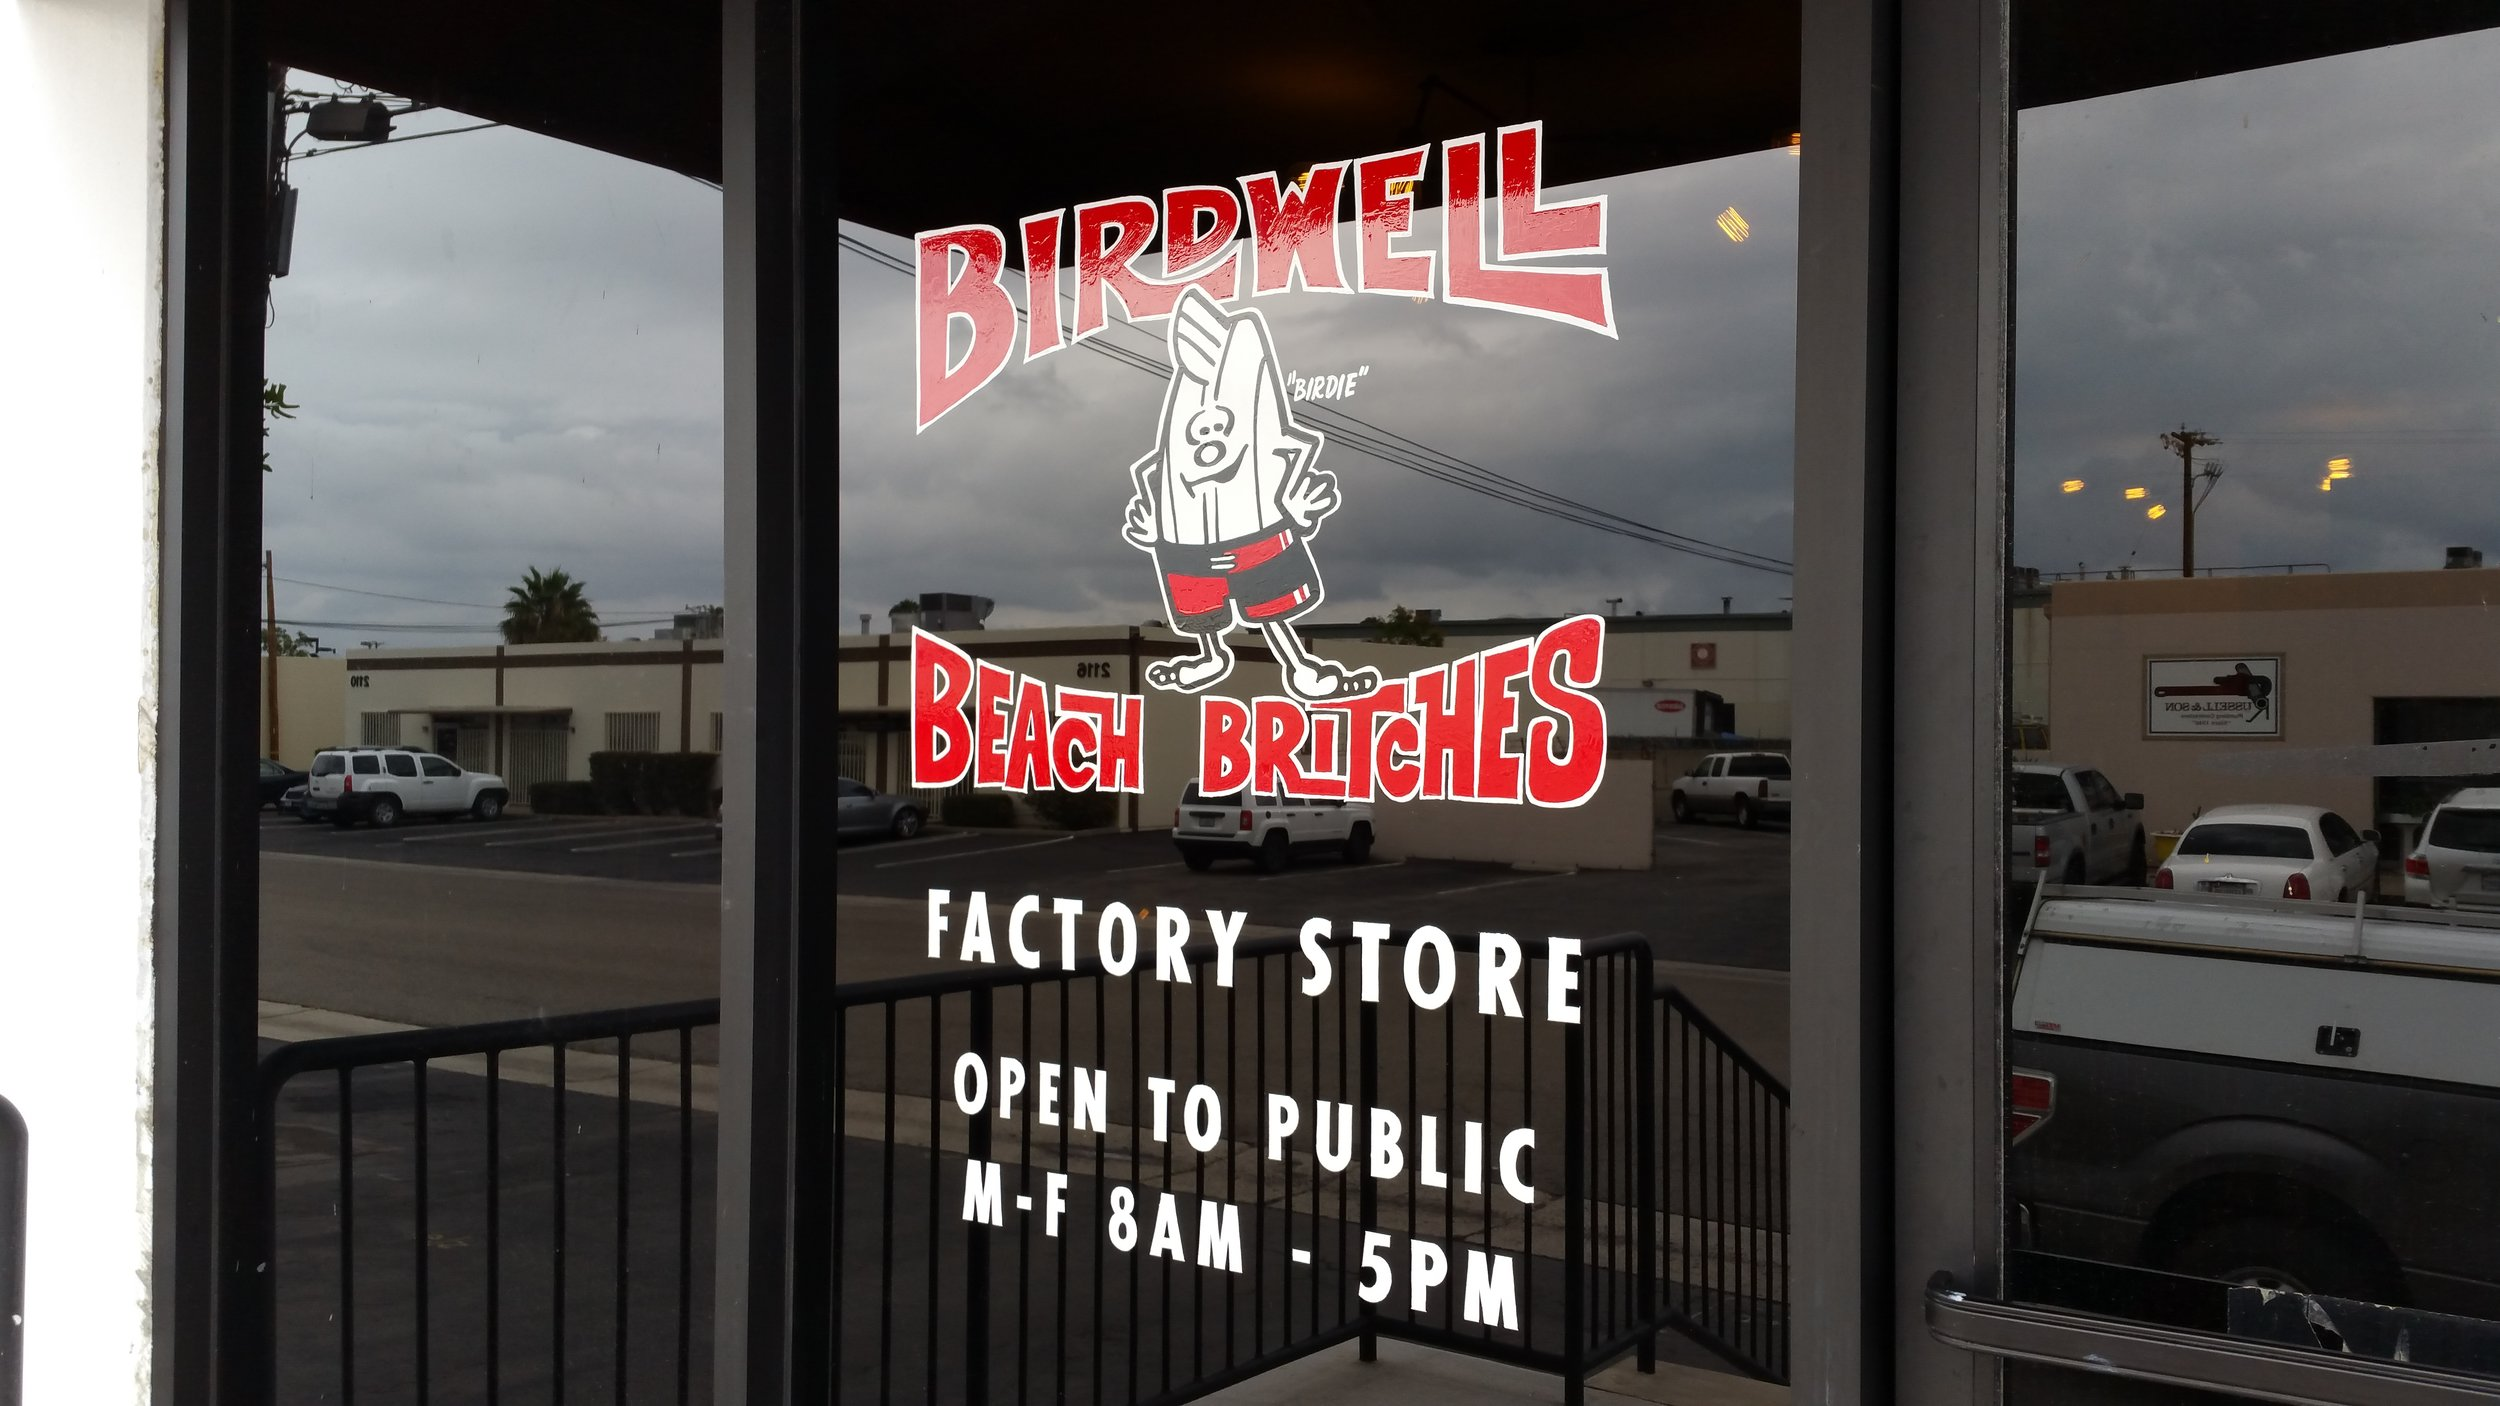 Birdwell Beach Britches Factory Store